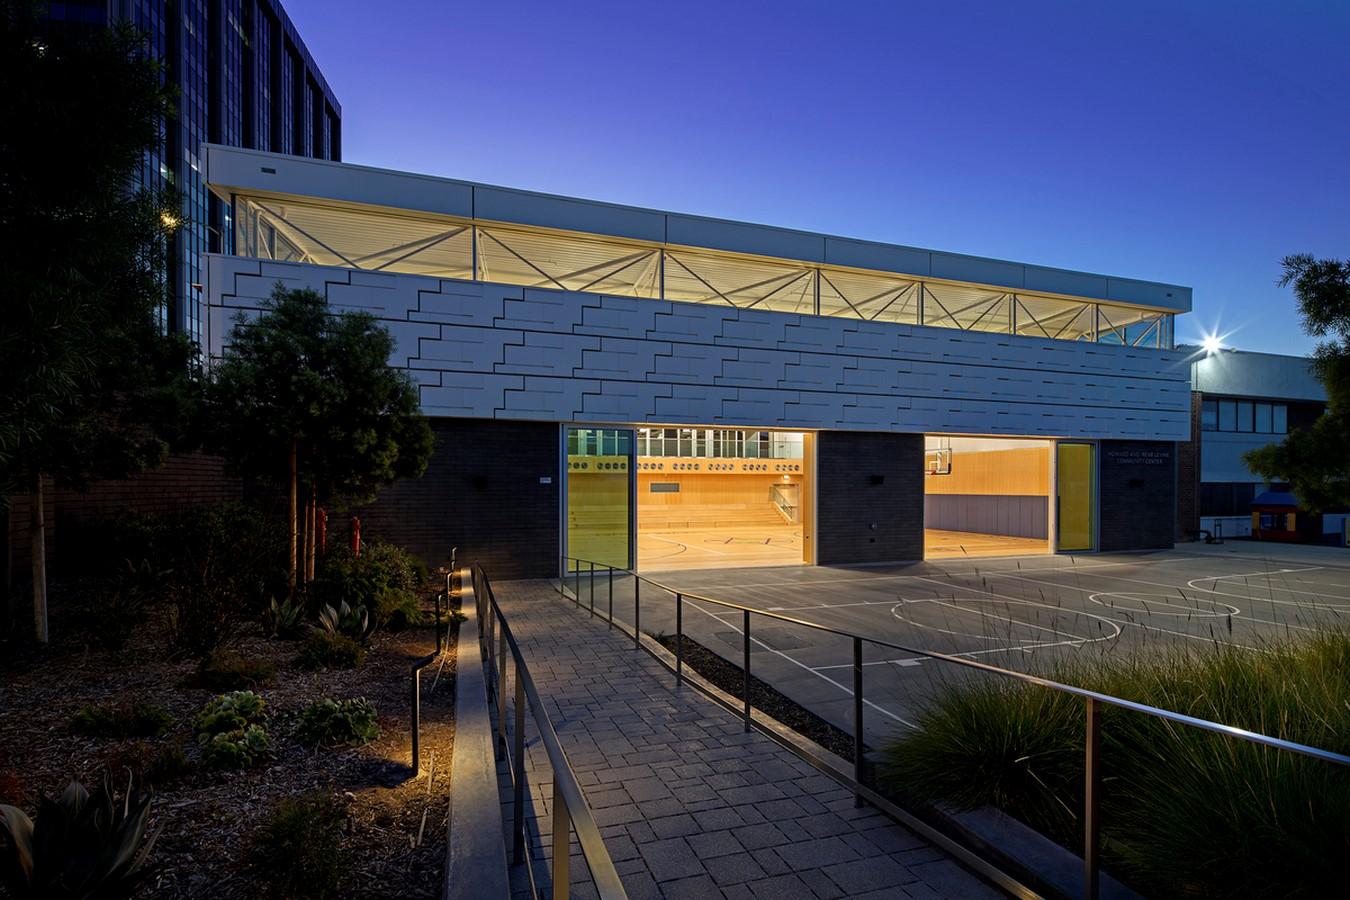 Valley Beth Shalom Community Center by Abramson Architects - sheet3